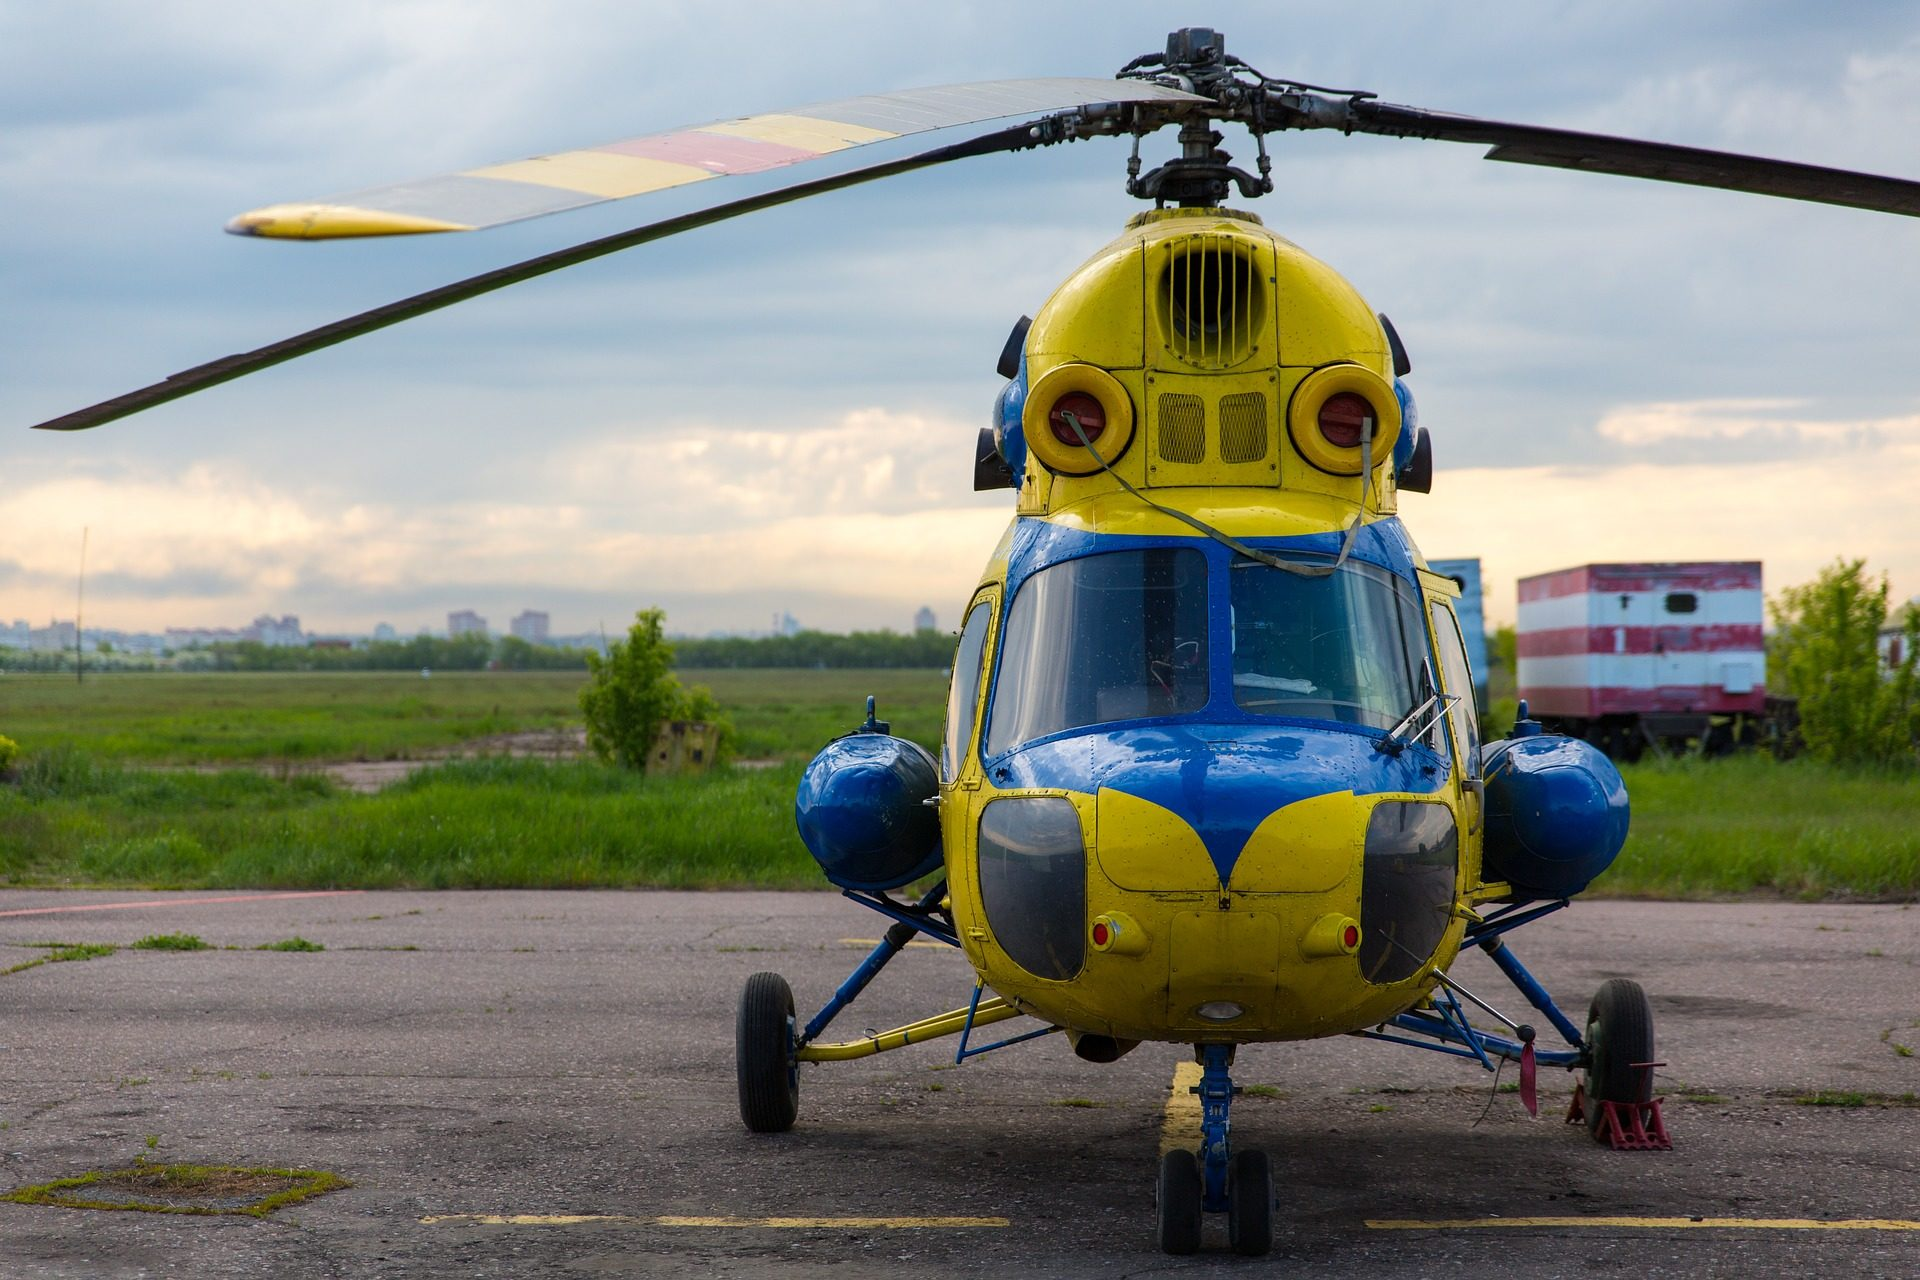 helicóptero, voar, hélices, cabine, rotor - Papéis de parede HD - Professor-falken.com